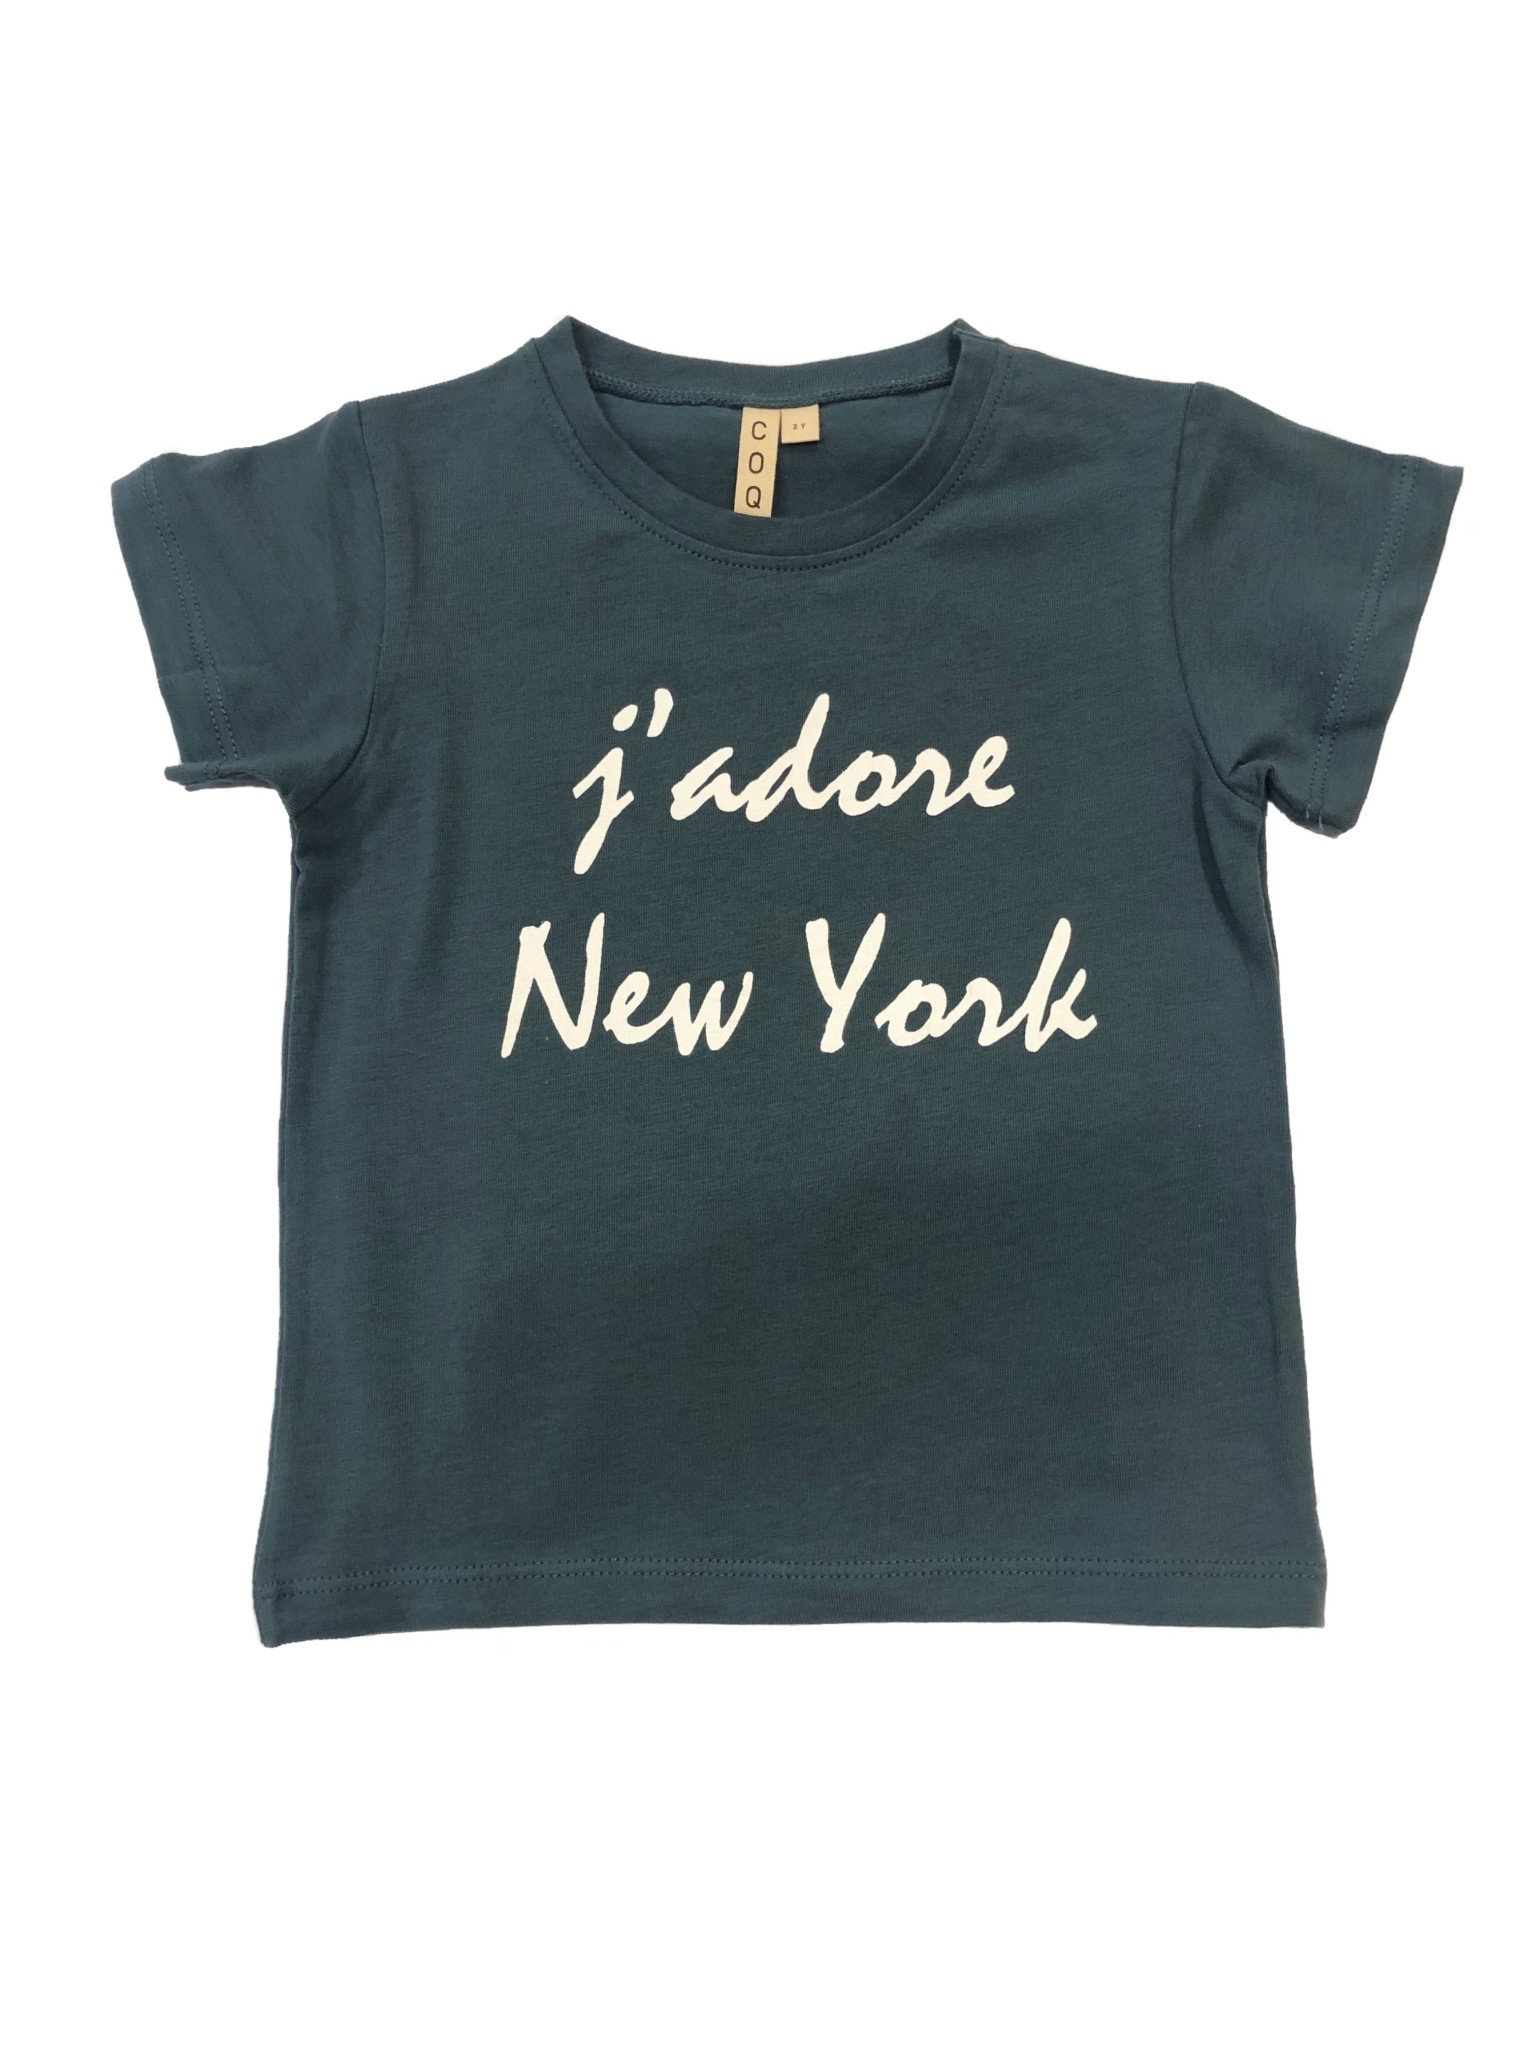 Green Baby T-Shirt